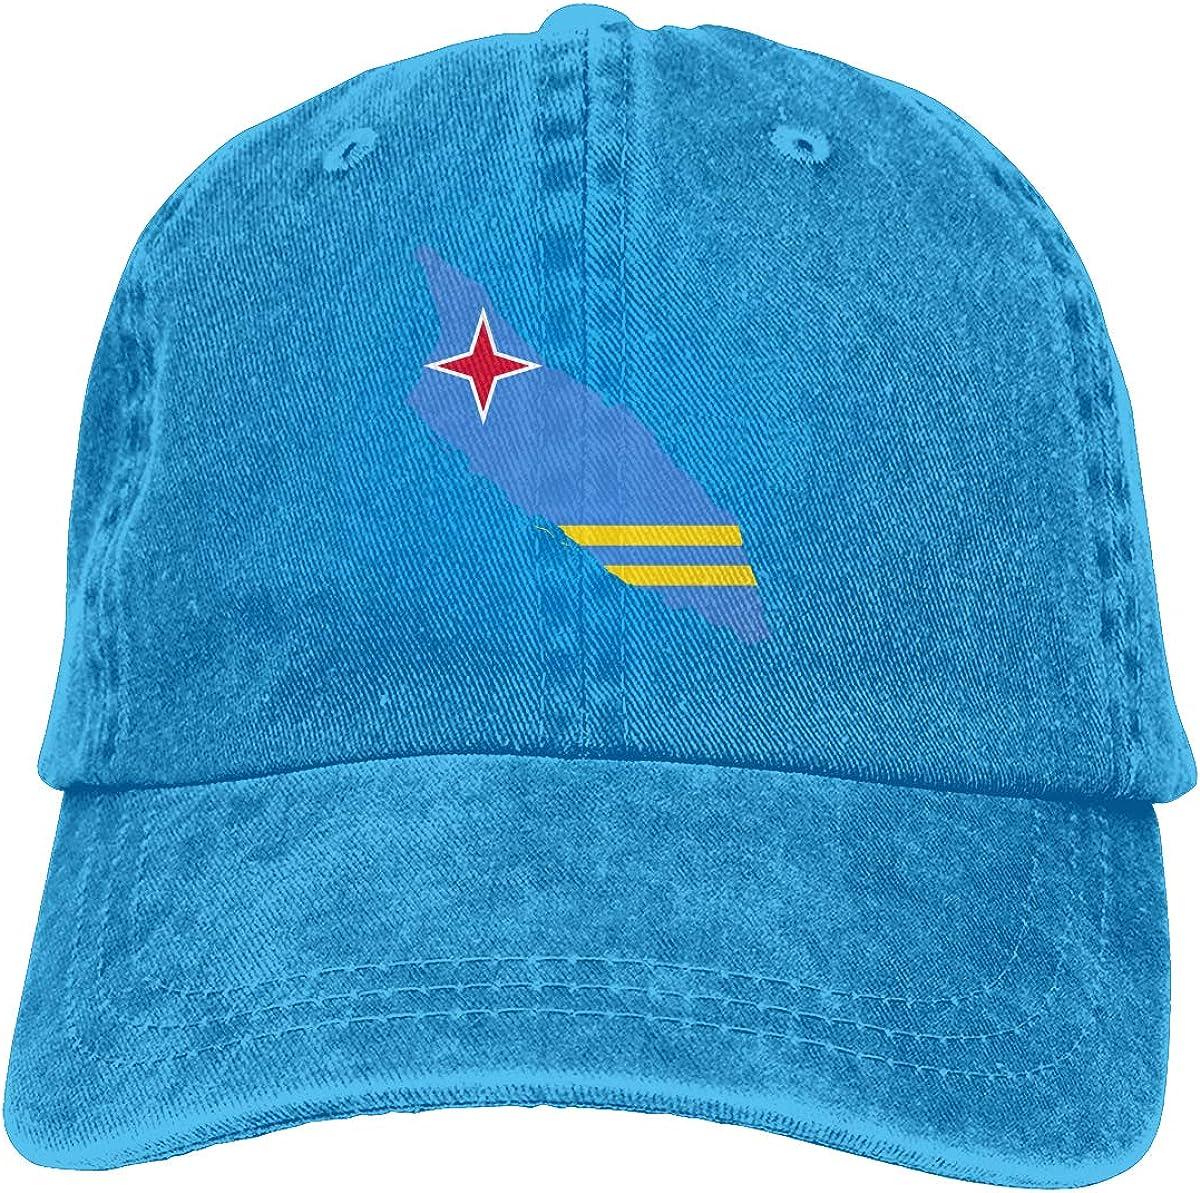 Adjustable Mens Denim Baseball Caps Flag Map of Aruba Funny Cotton Hats